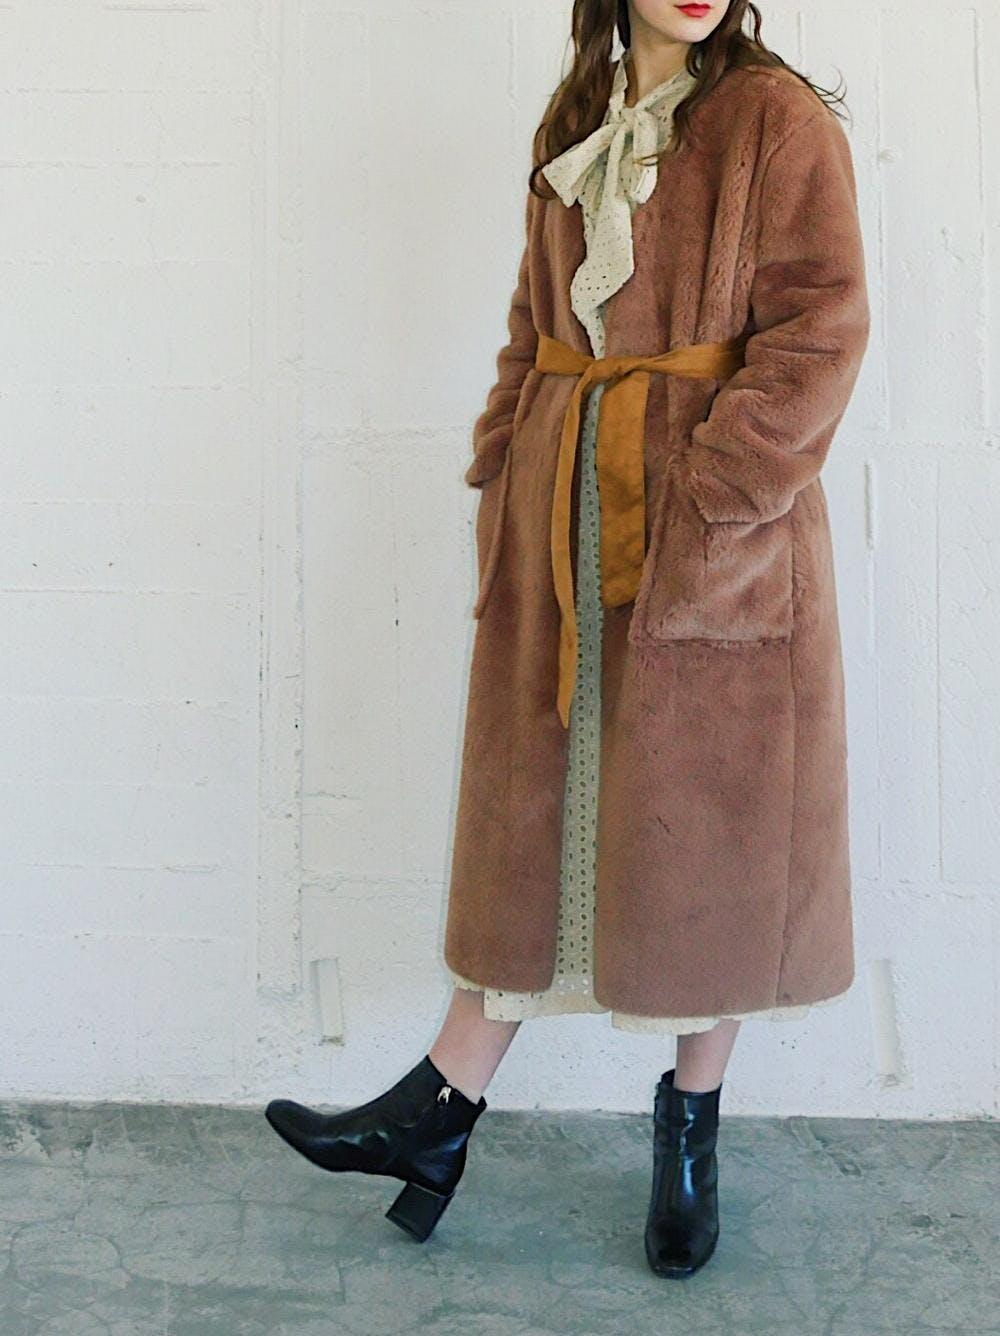 caramel fur coat